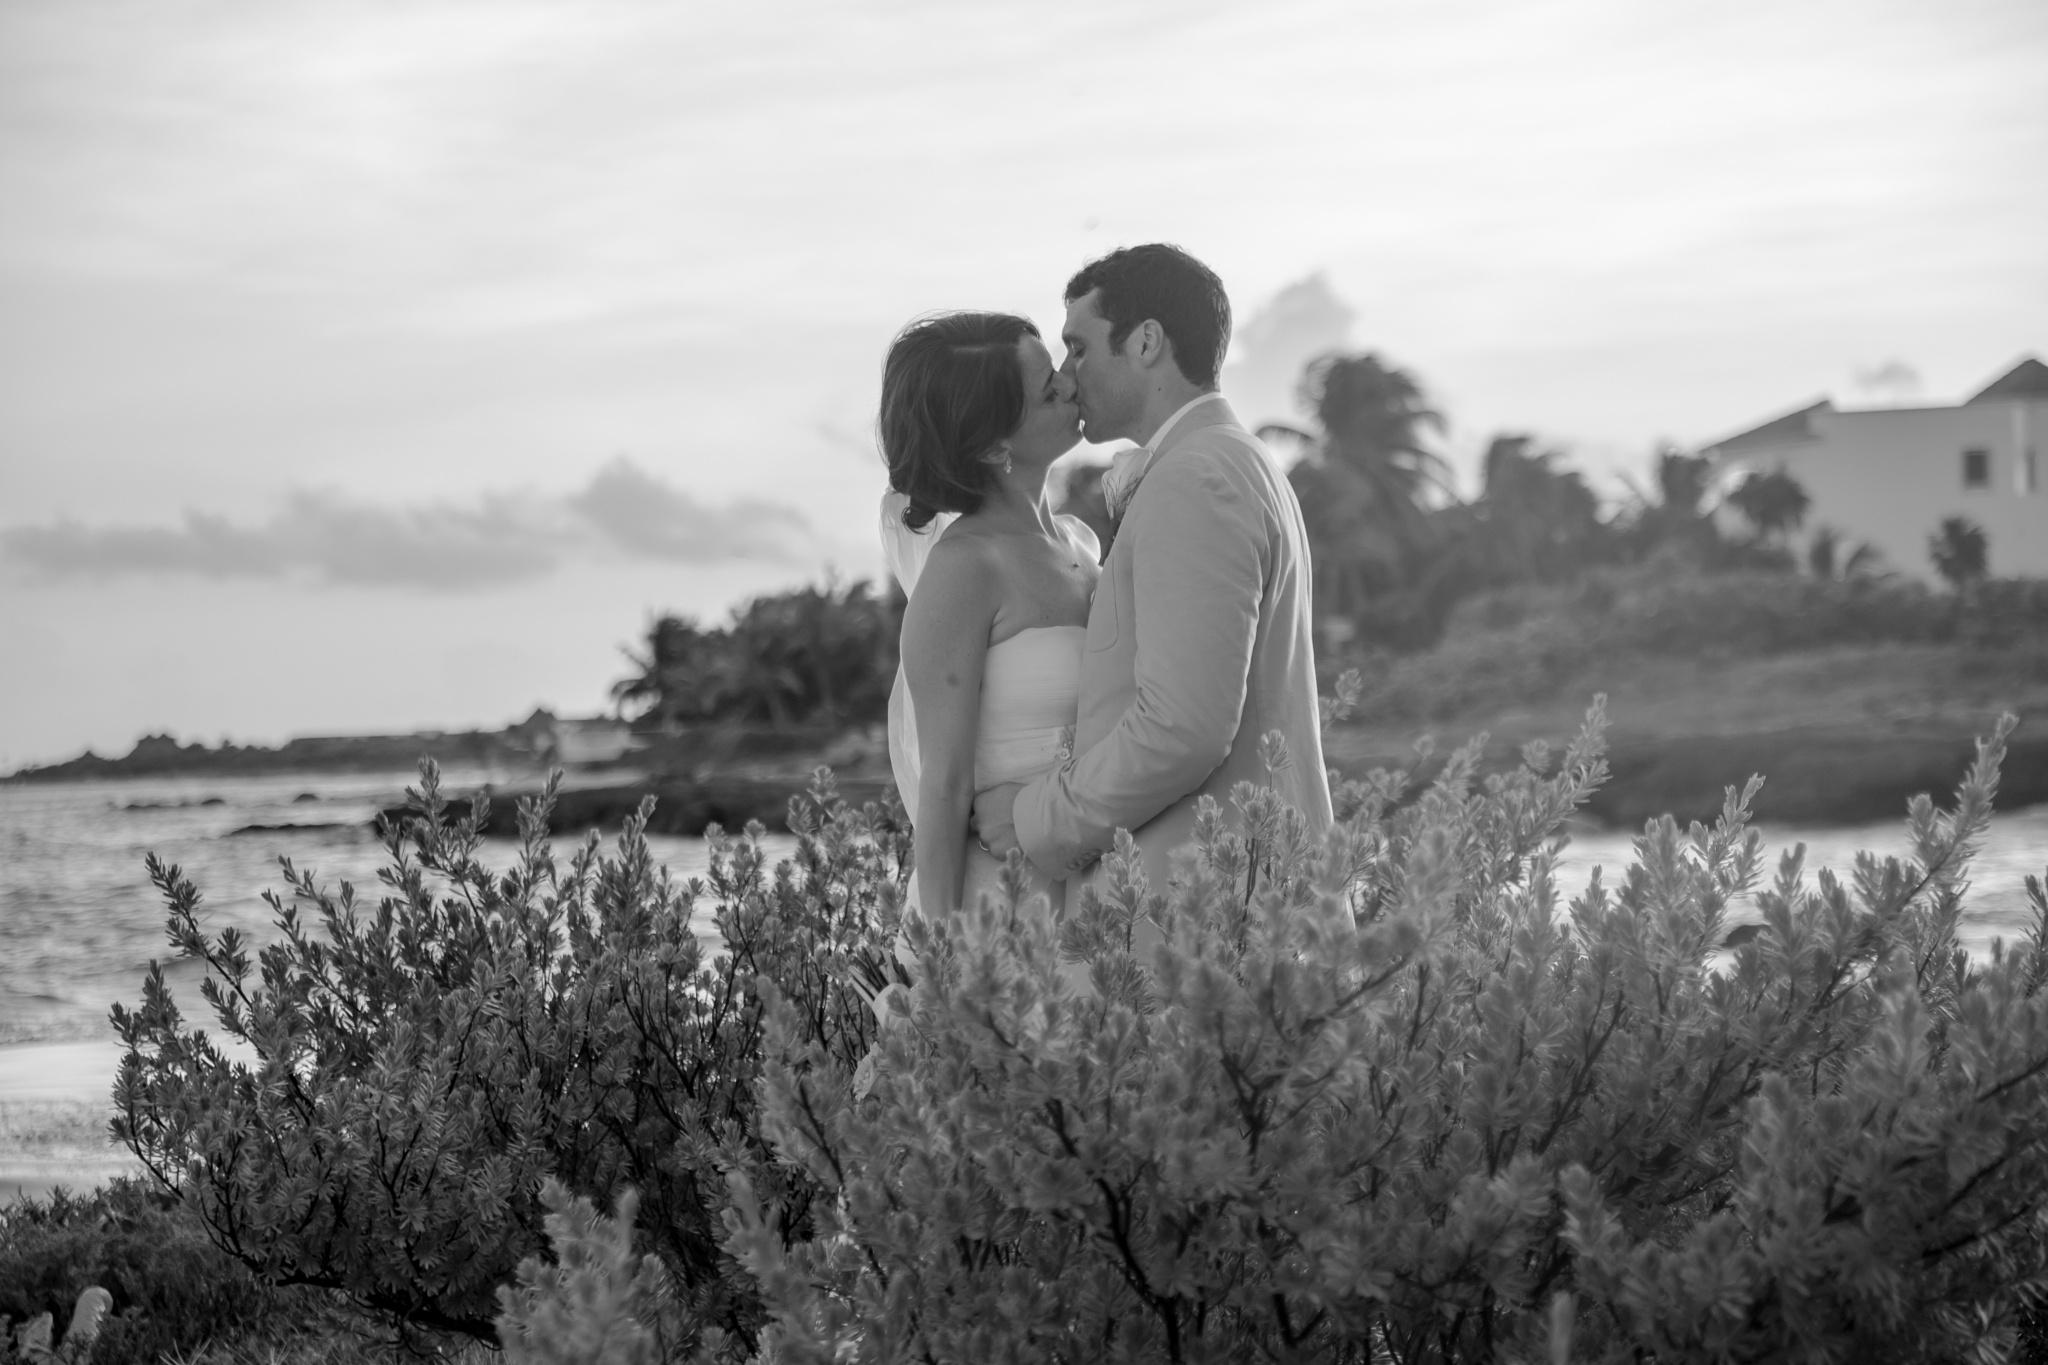 First kiss on b&w by AlexMelendezPhoto